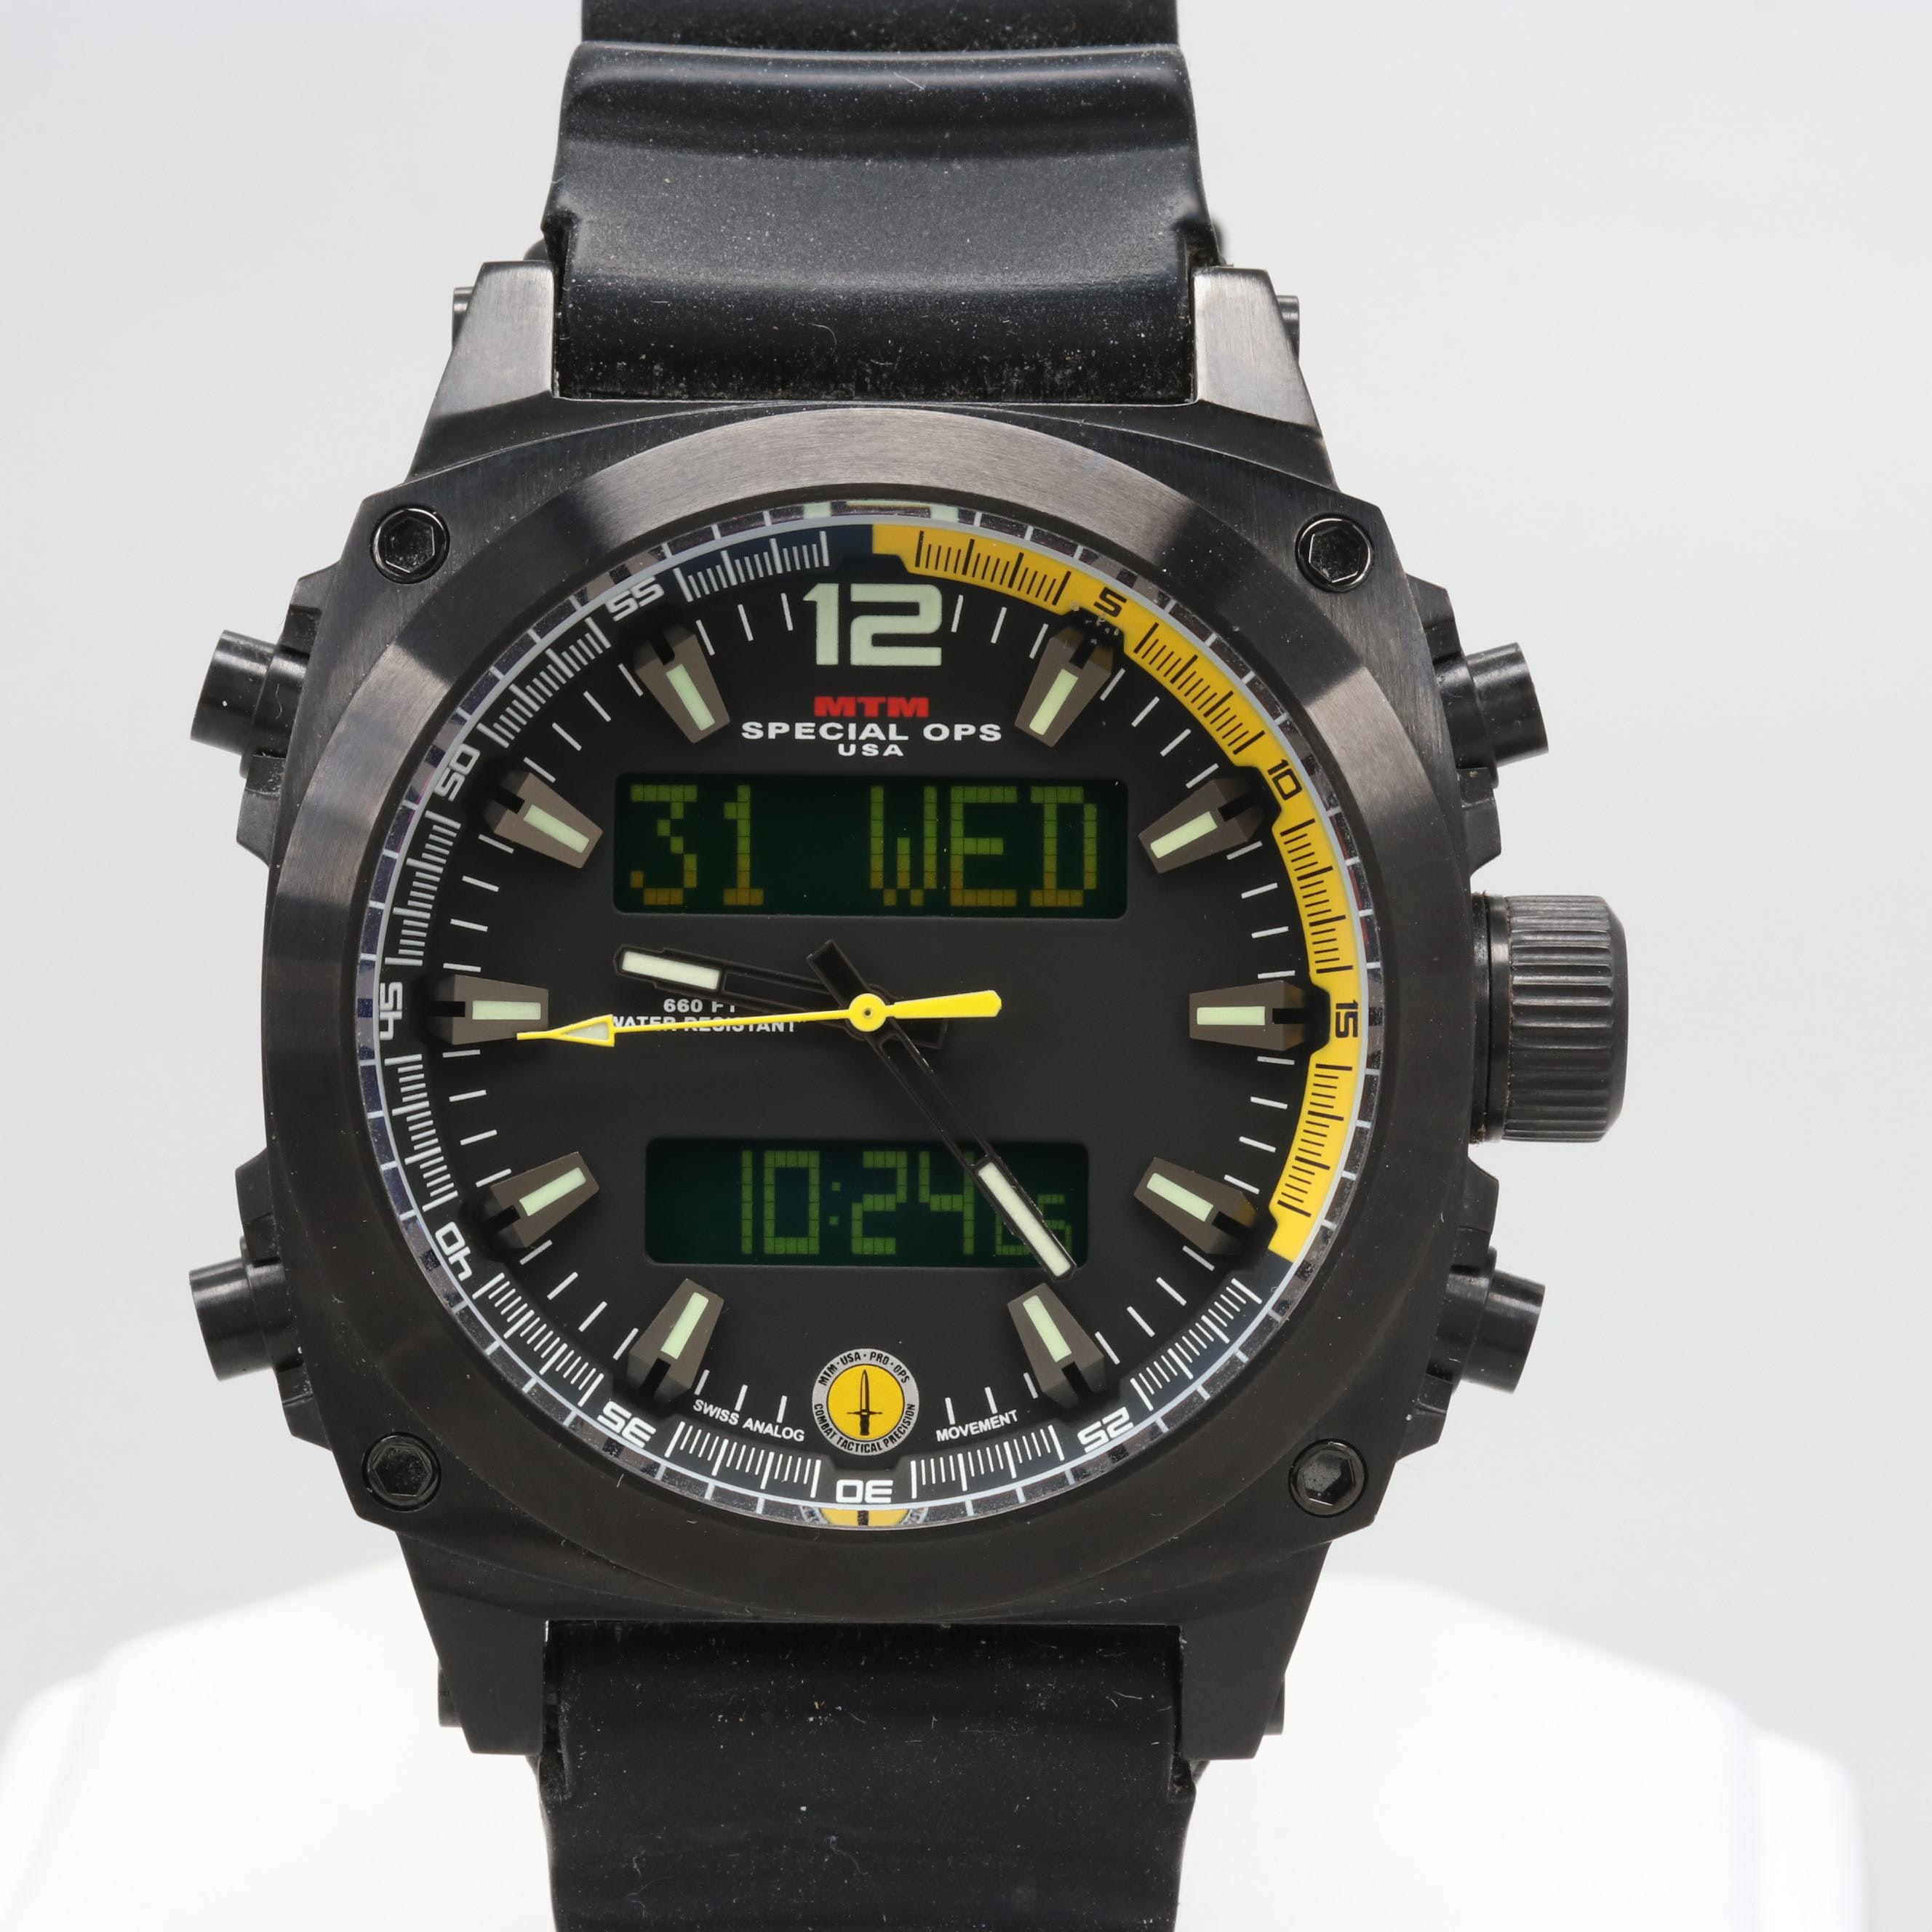 MTM Special Ops 660 Feet Water Resistant Wristwatch